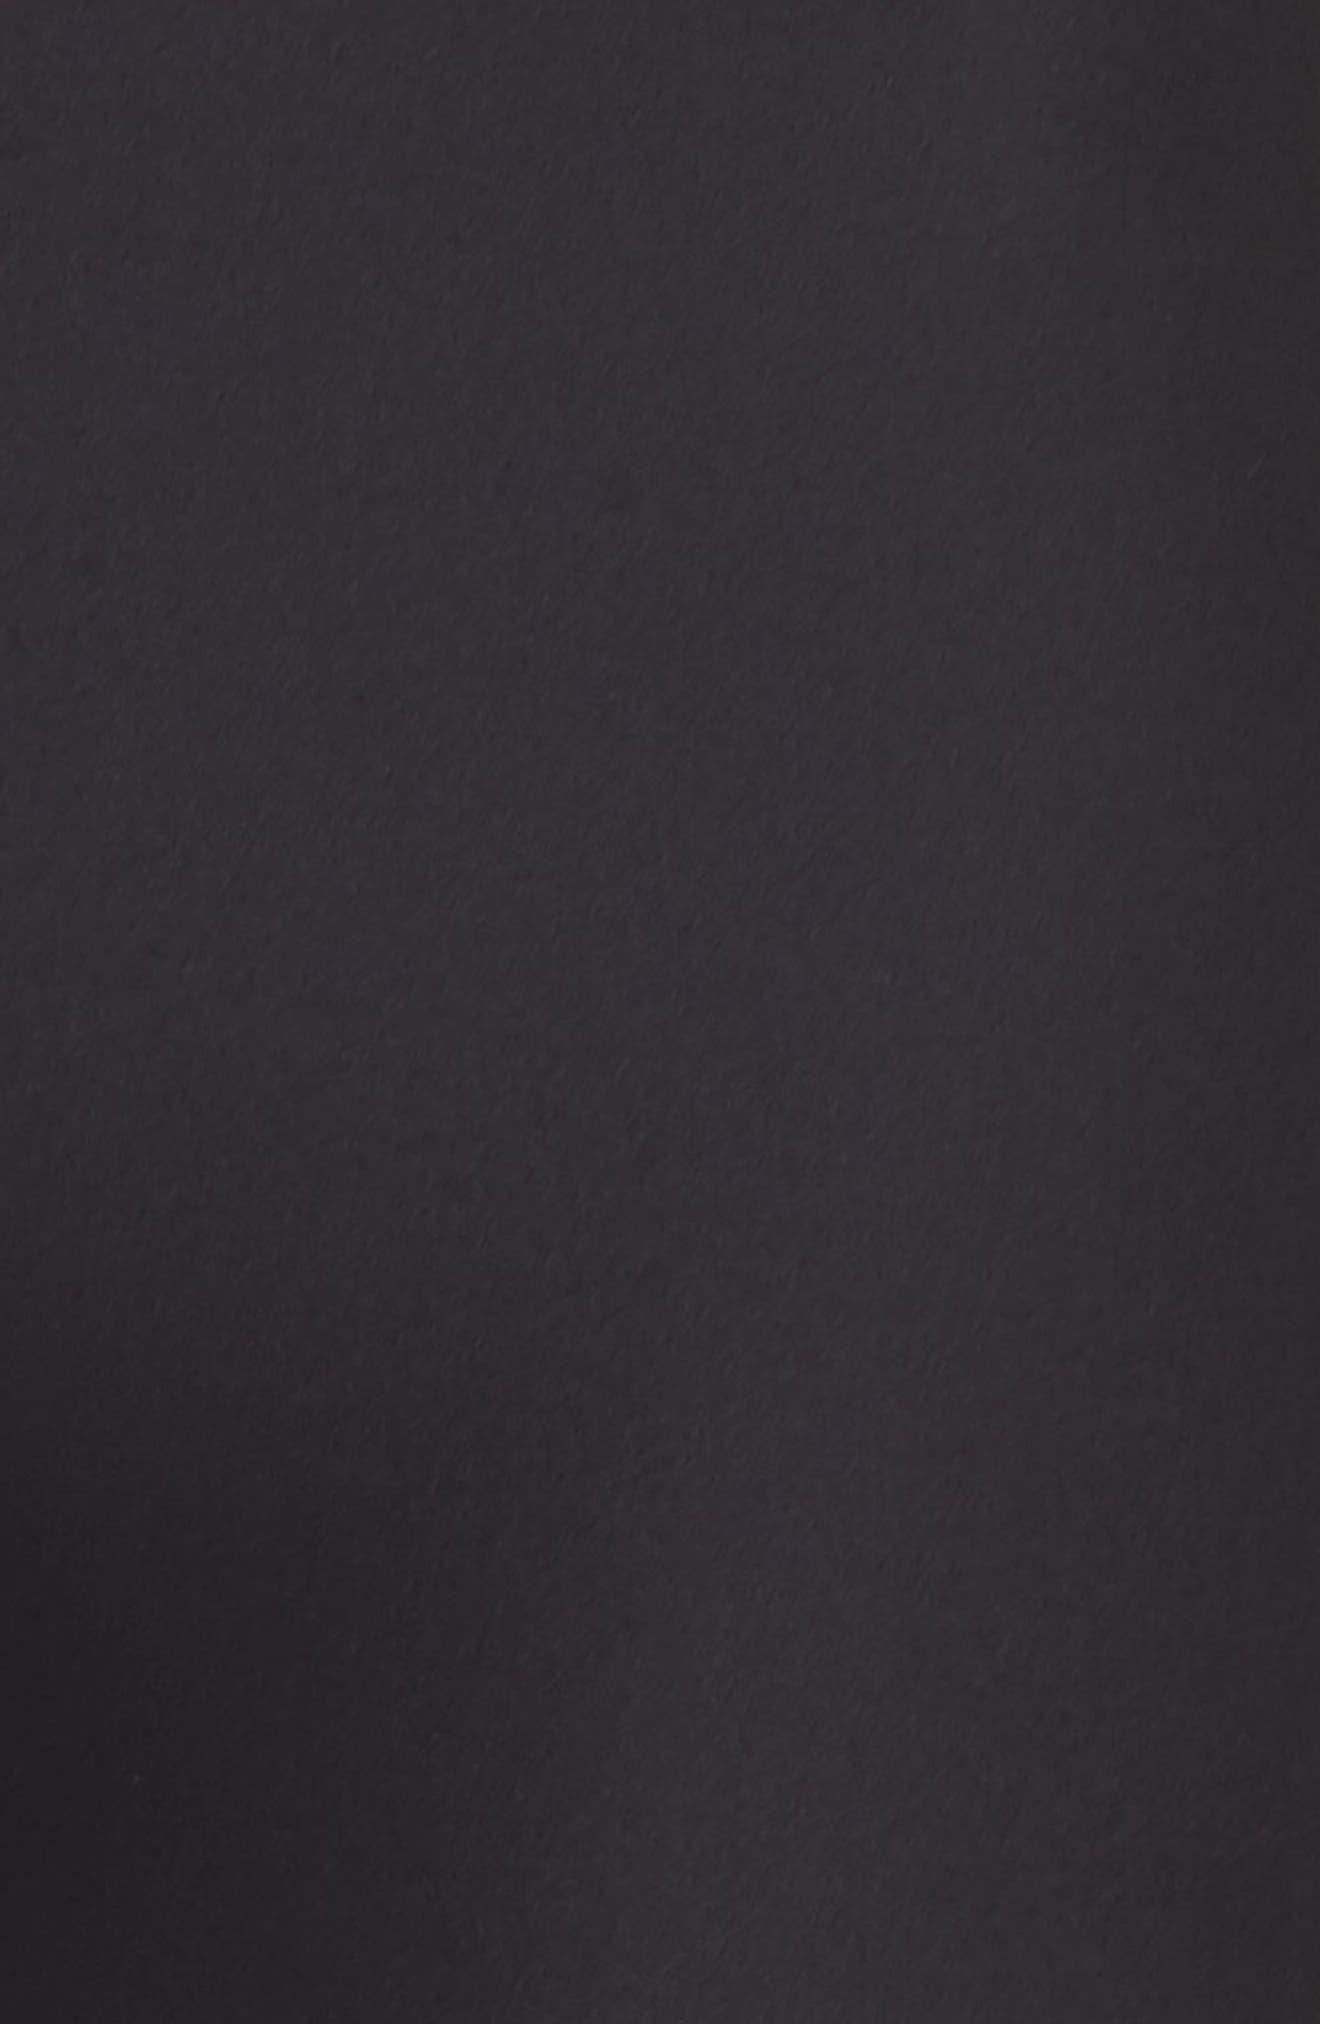 Ultra Lux Collegiate Leggings,                             Alternate thumbnail 6, color,                             Nero Rose Silver